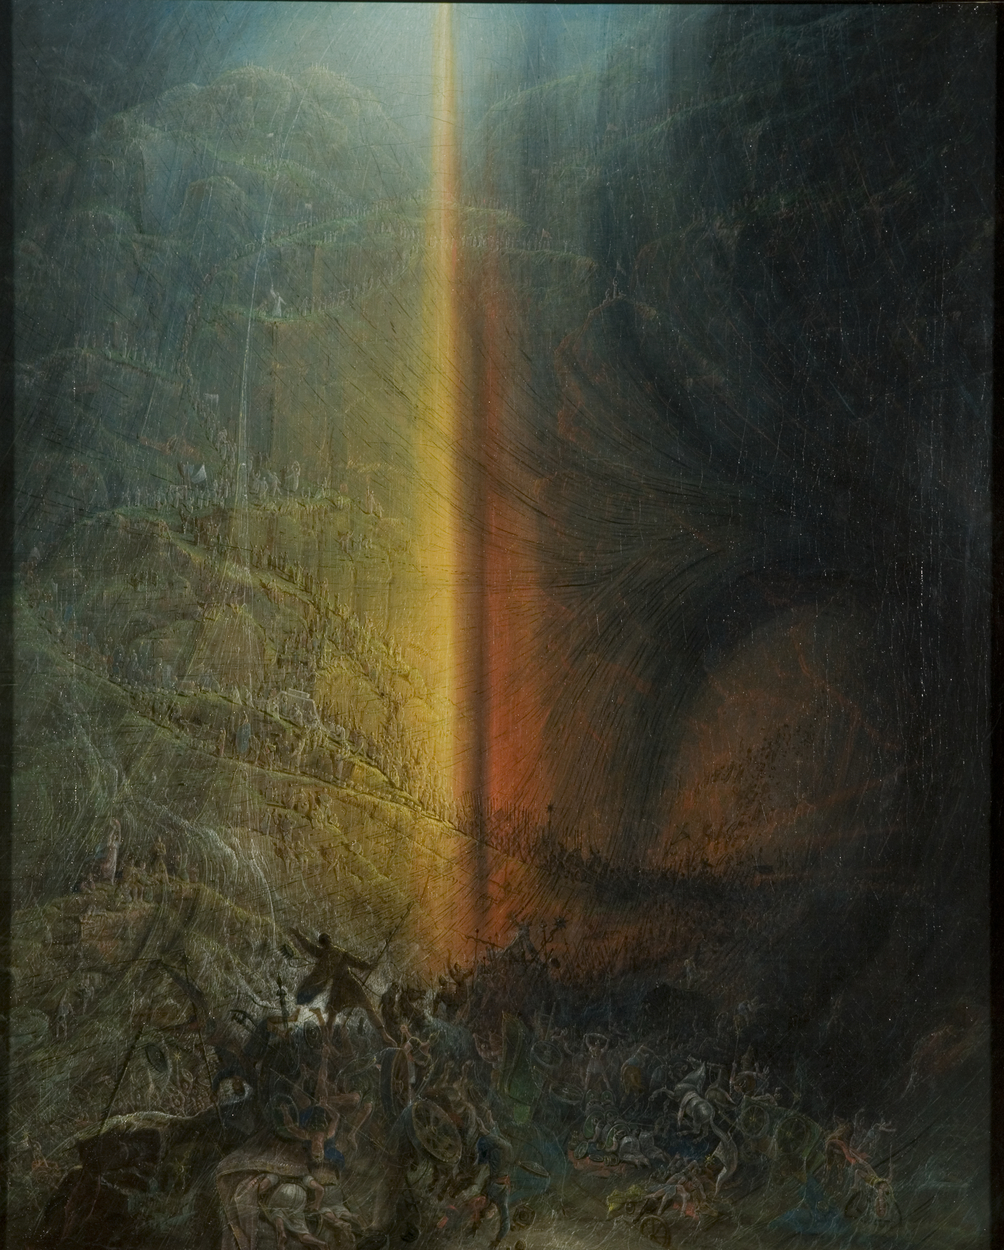 Painting of Biblical scene